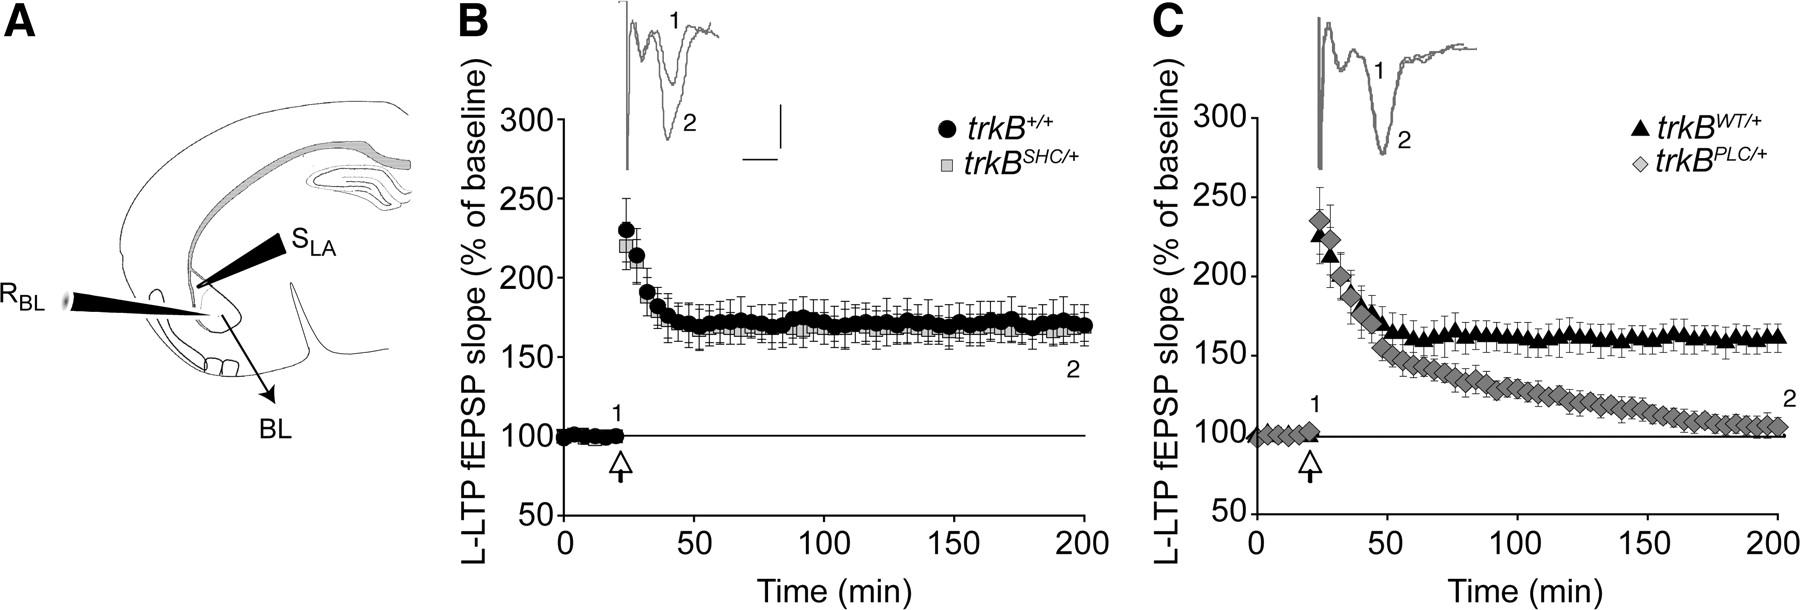 trkb modulates fear learning and amygdalar synaptic